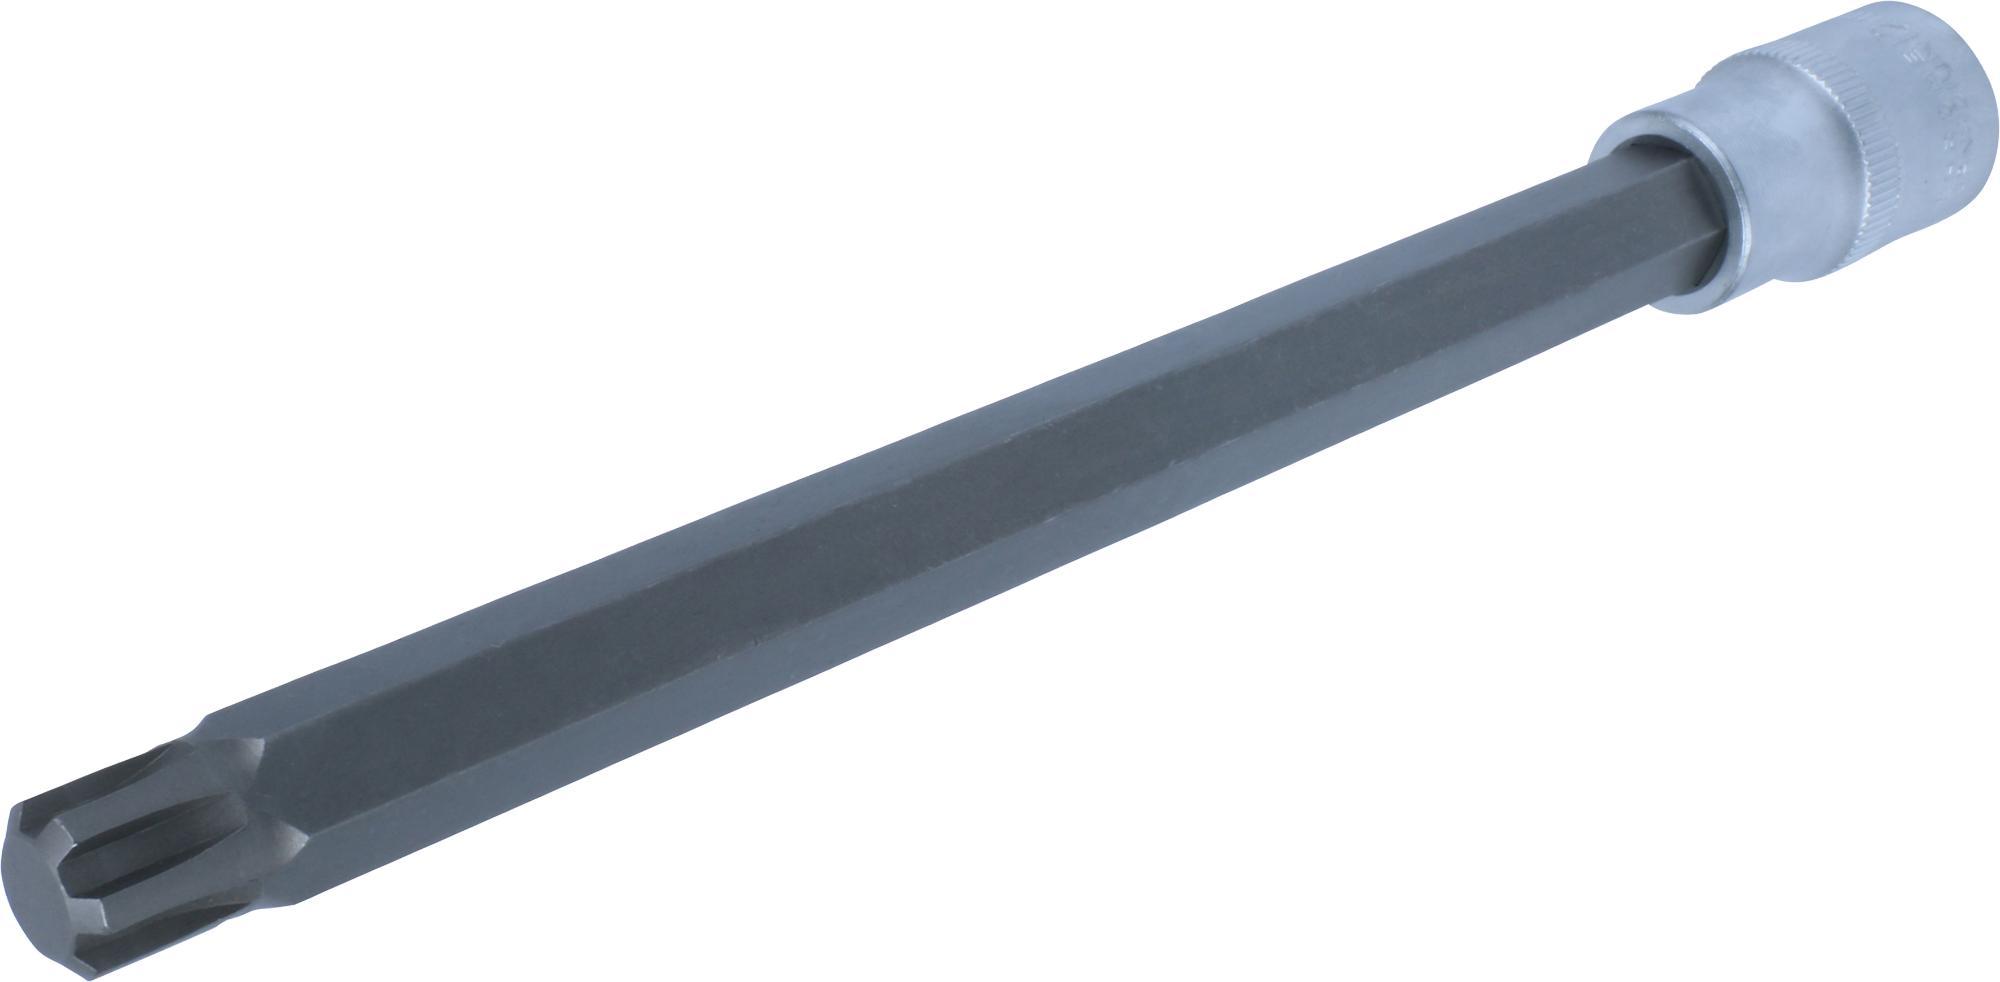 "Nástavec, 1/2"", Keilnut M12x200 mm"